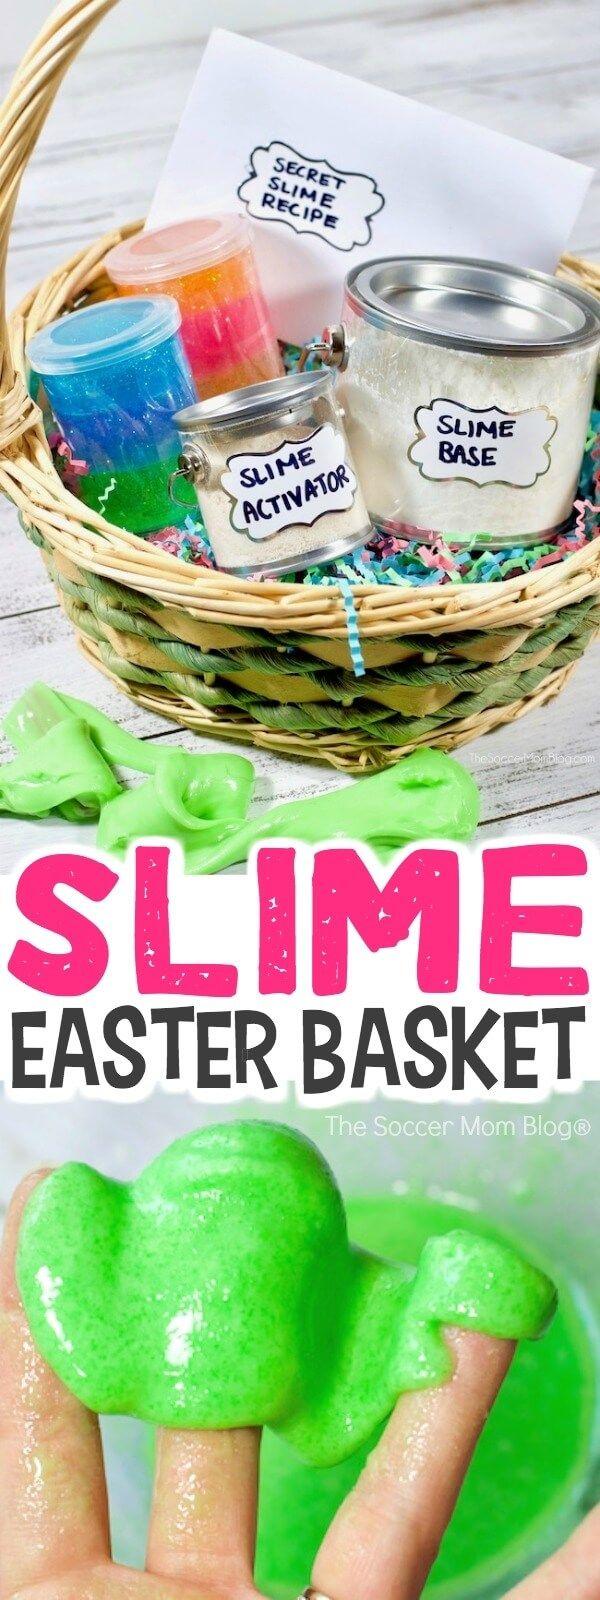 732 best Easter Ideas for Kids images on Pinterest | Easter, Easter ...